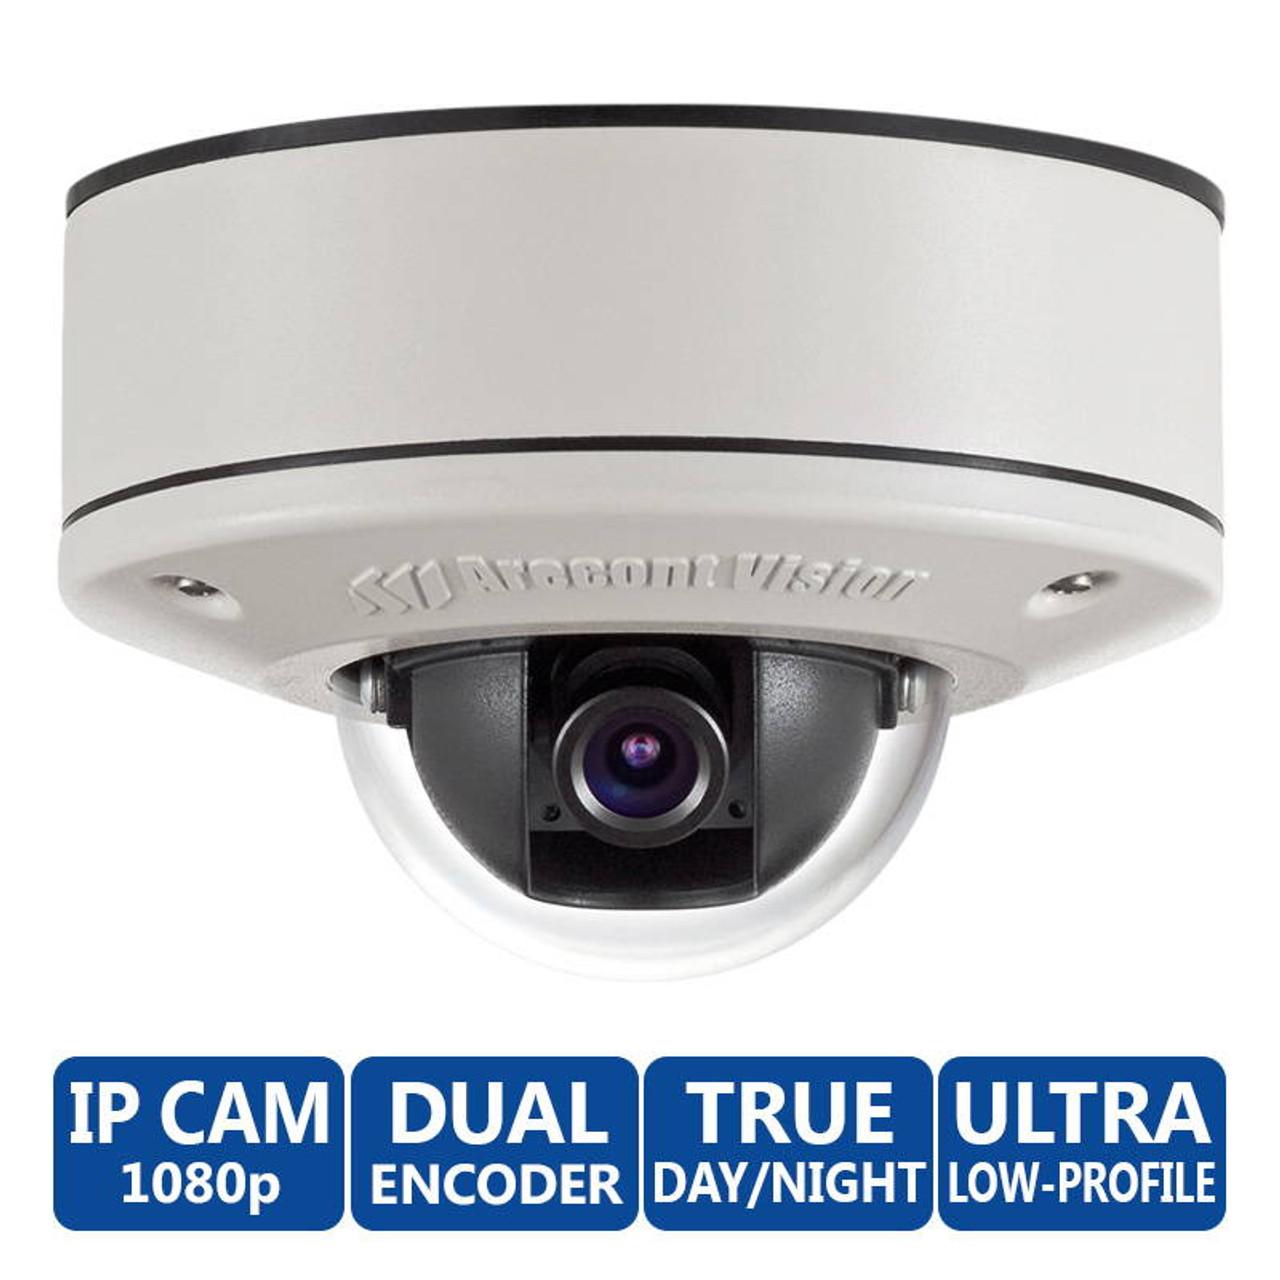 NEW DRIVER: ARECONT VISION AV2456DN-S IP CAMERA